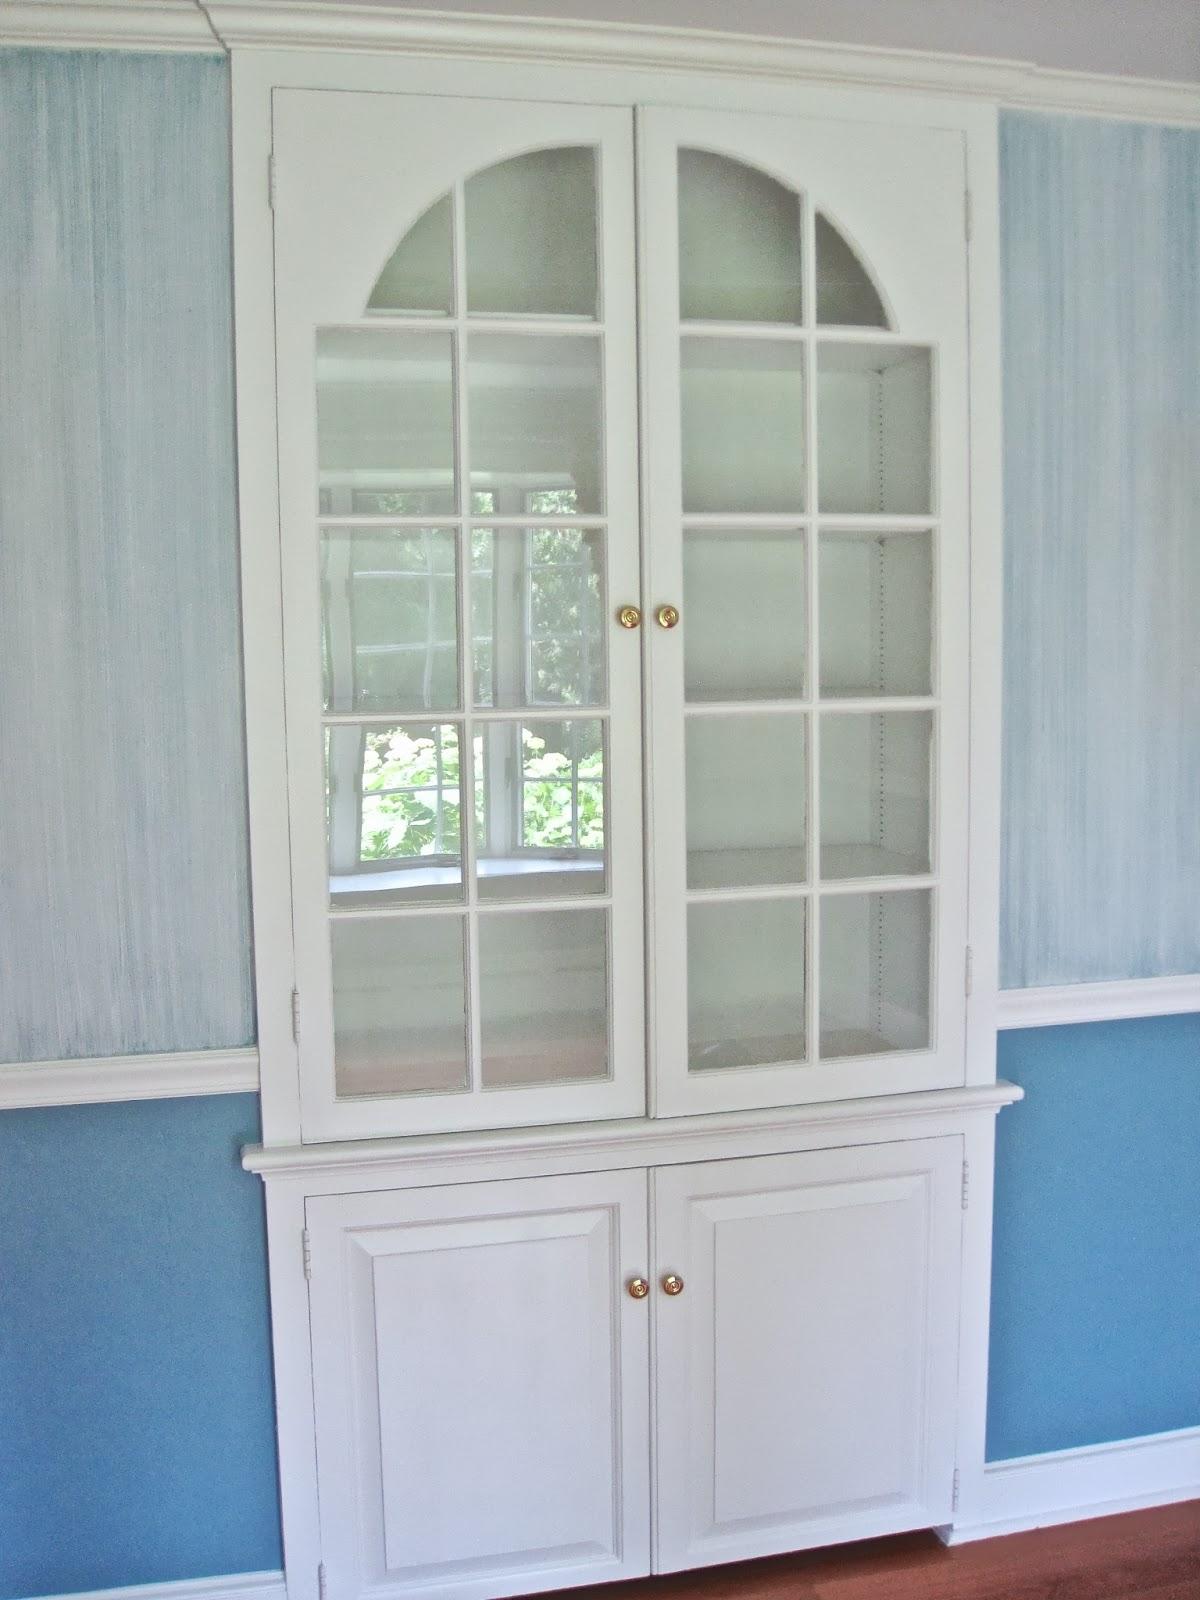 Corner Cabinets Dining Room Furniture Cabinets Dining Corner Traditional Living Room Ideas Corner